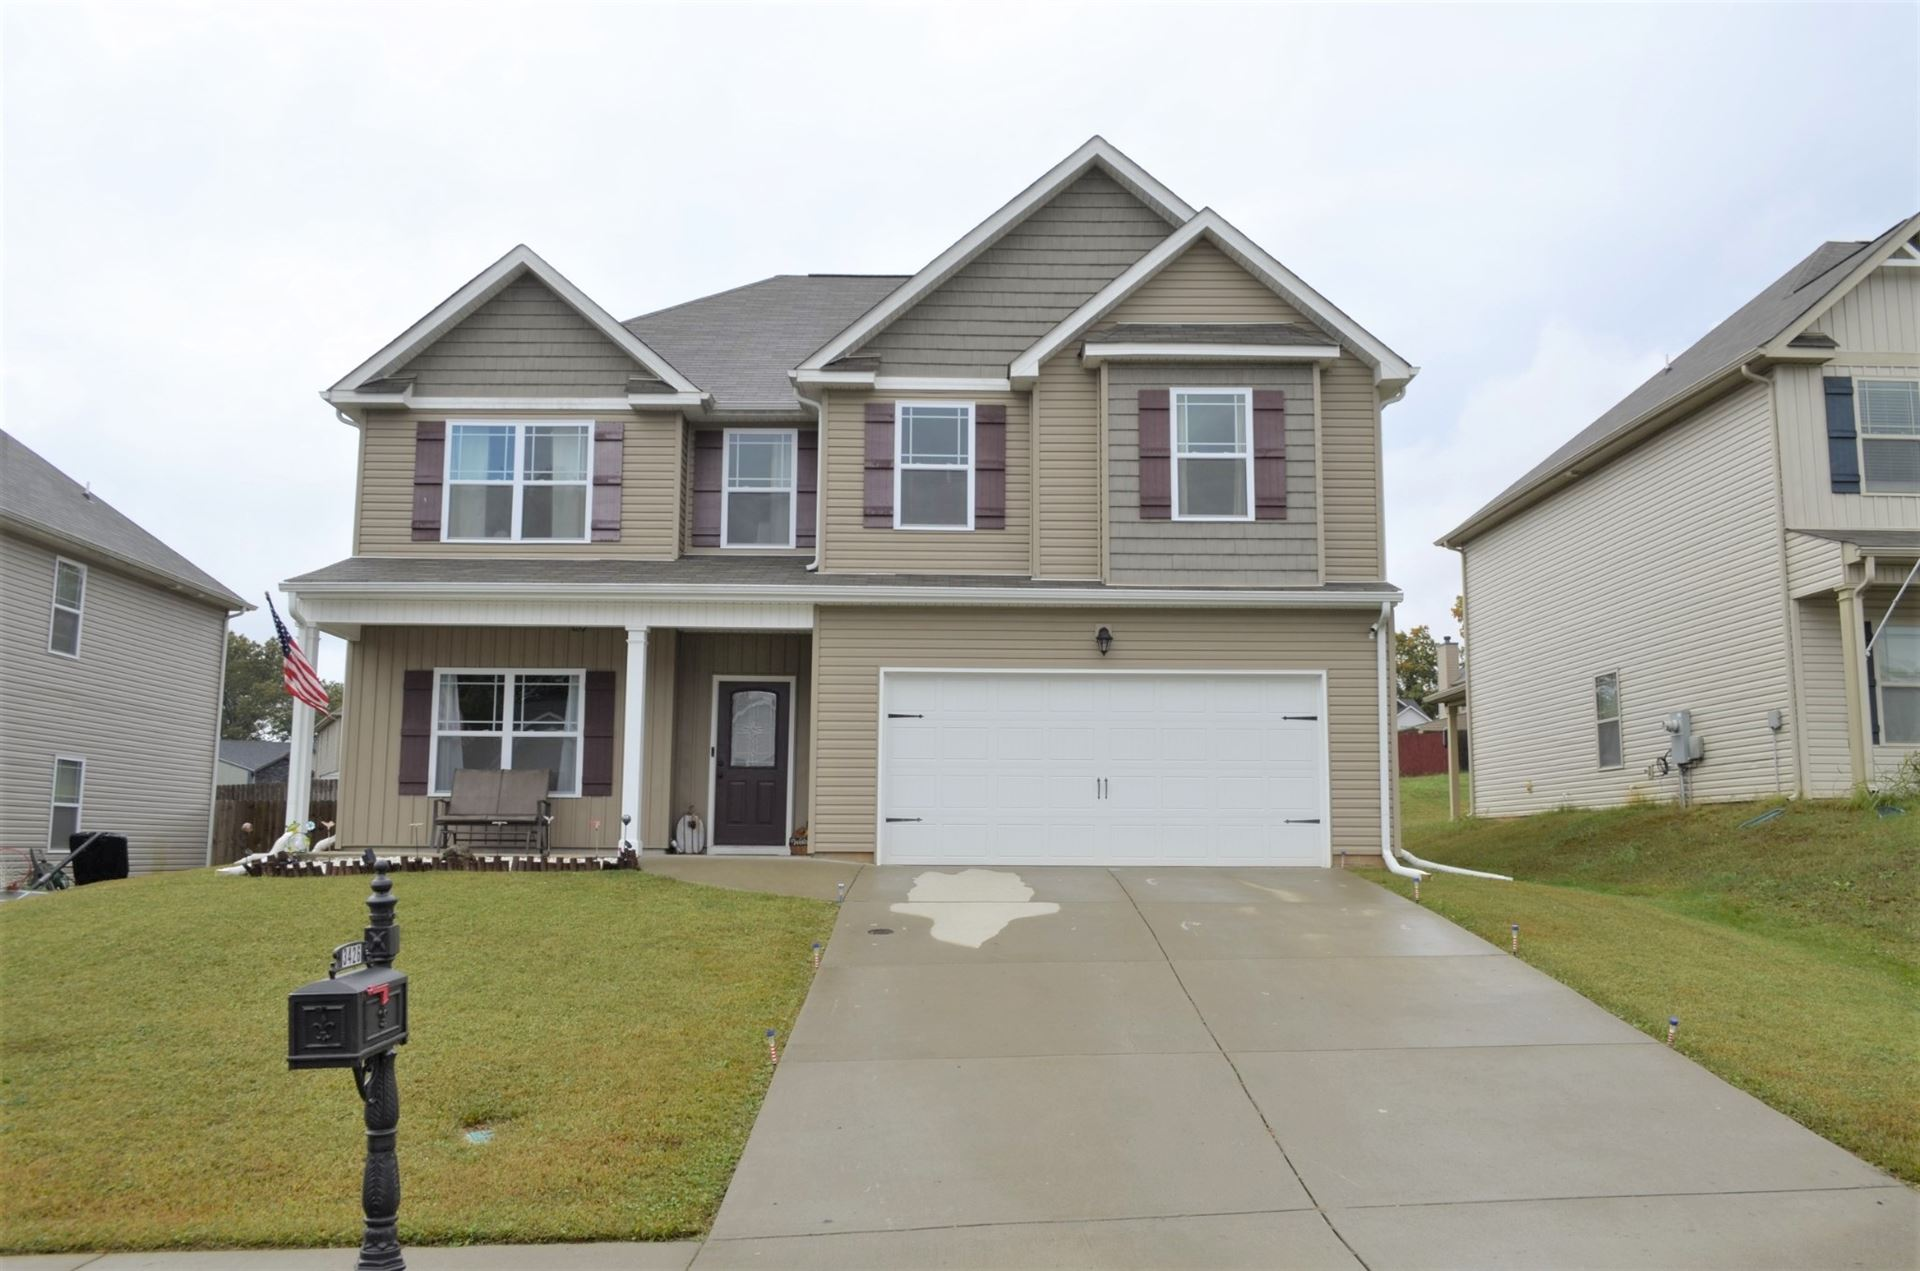 3426 Oconnor Ln, Clarksville, TN 37042 - MLS#: 2197374